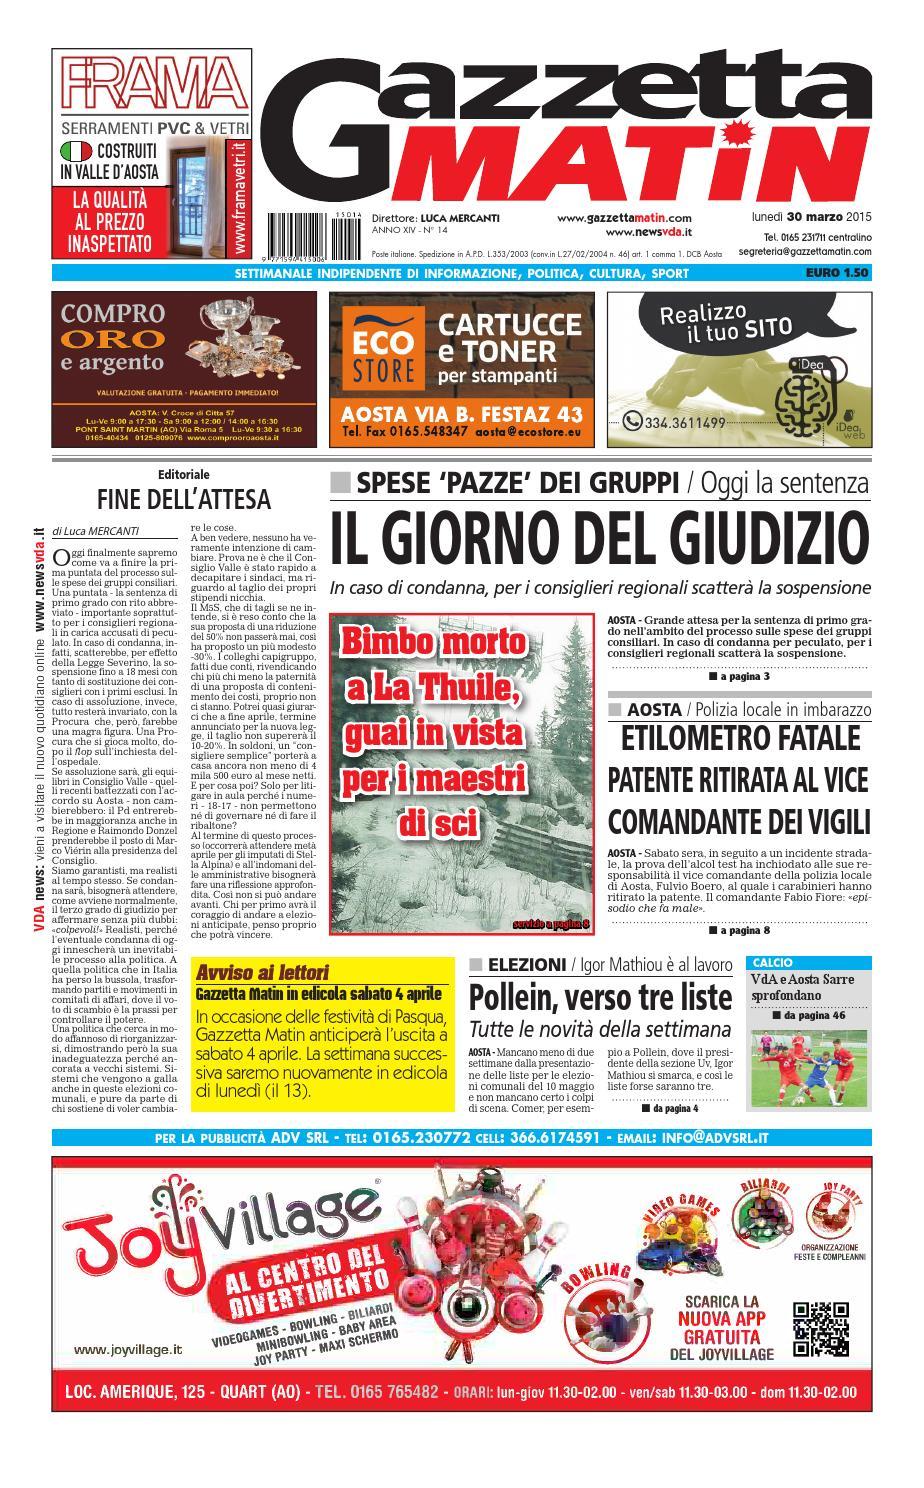 Gazzetta Matin del 30 marzo 2015 by NewsVDA - issuu